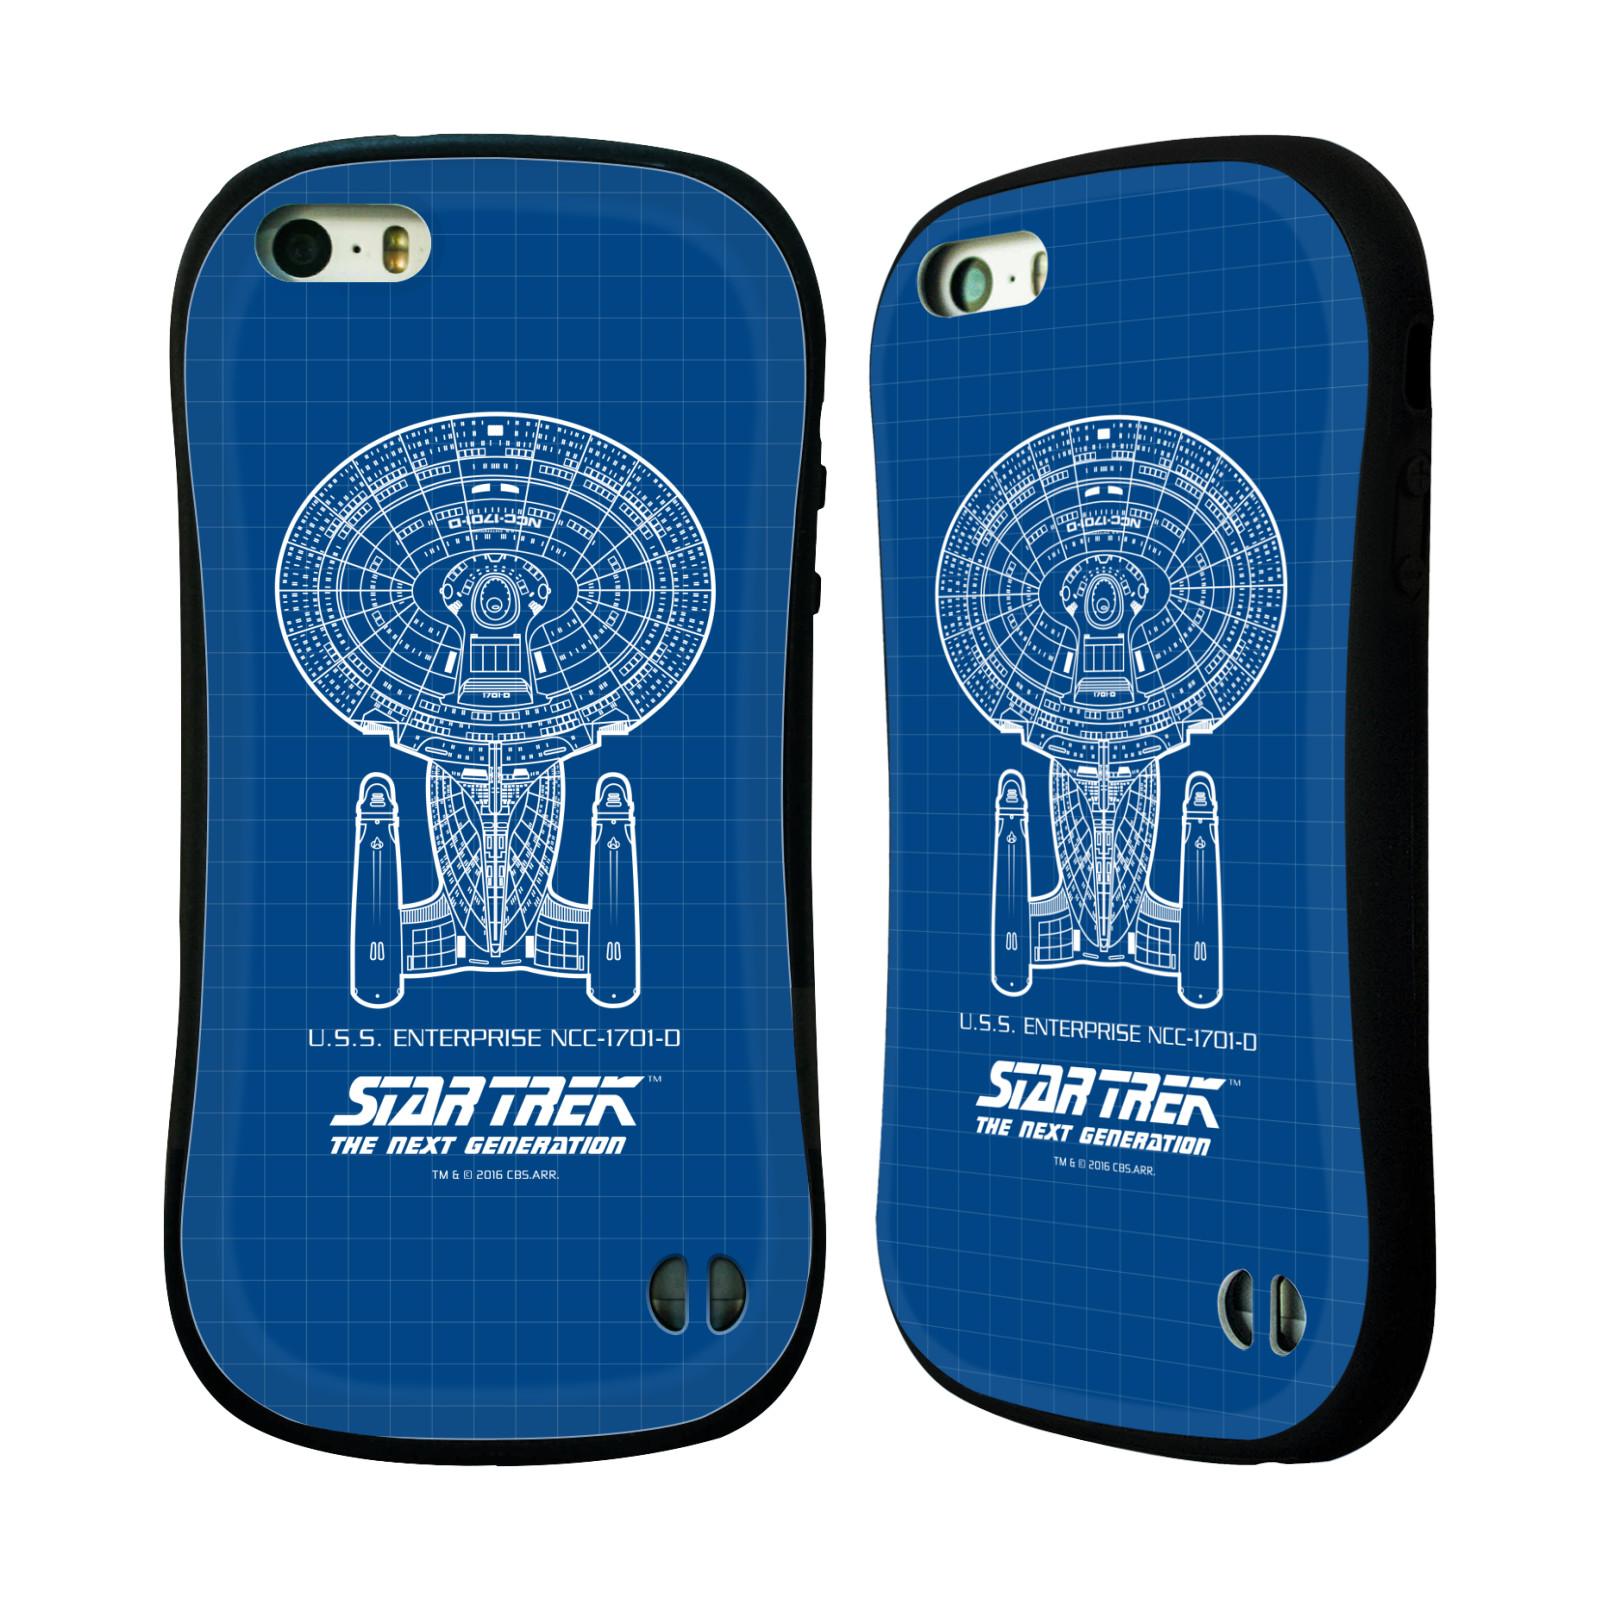 HEAD CASE silikon/plast odolný obal na mobil Apple Iphone 5 / 5S Star Trek vesmírná loď nákres USS Enterprise NCC-1701-D modrá